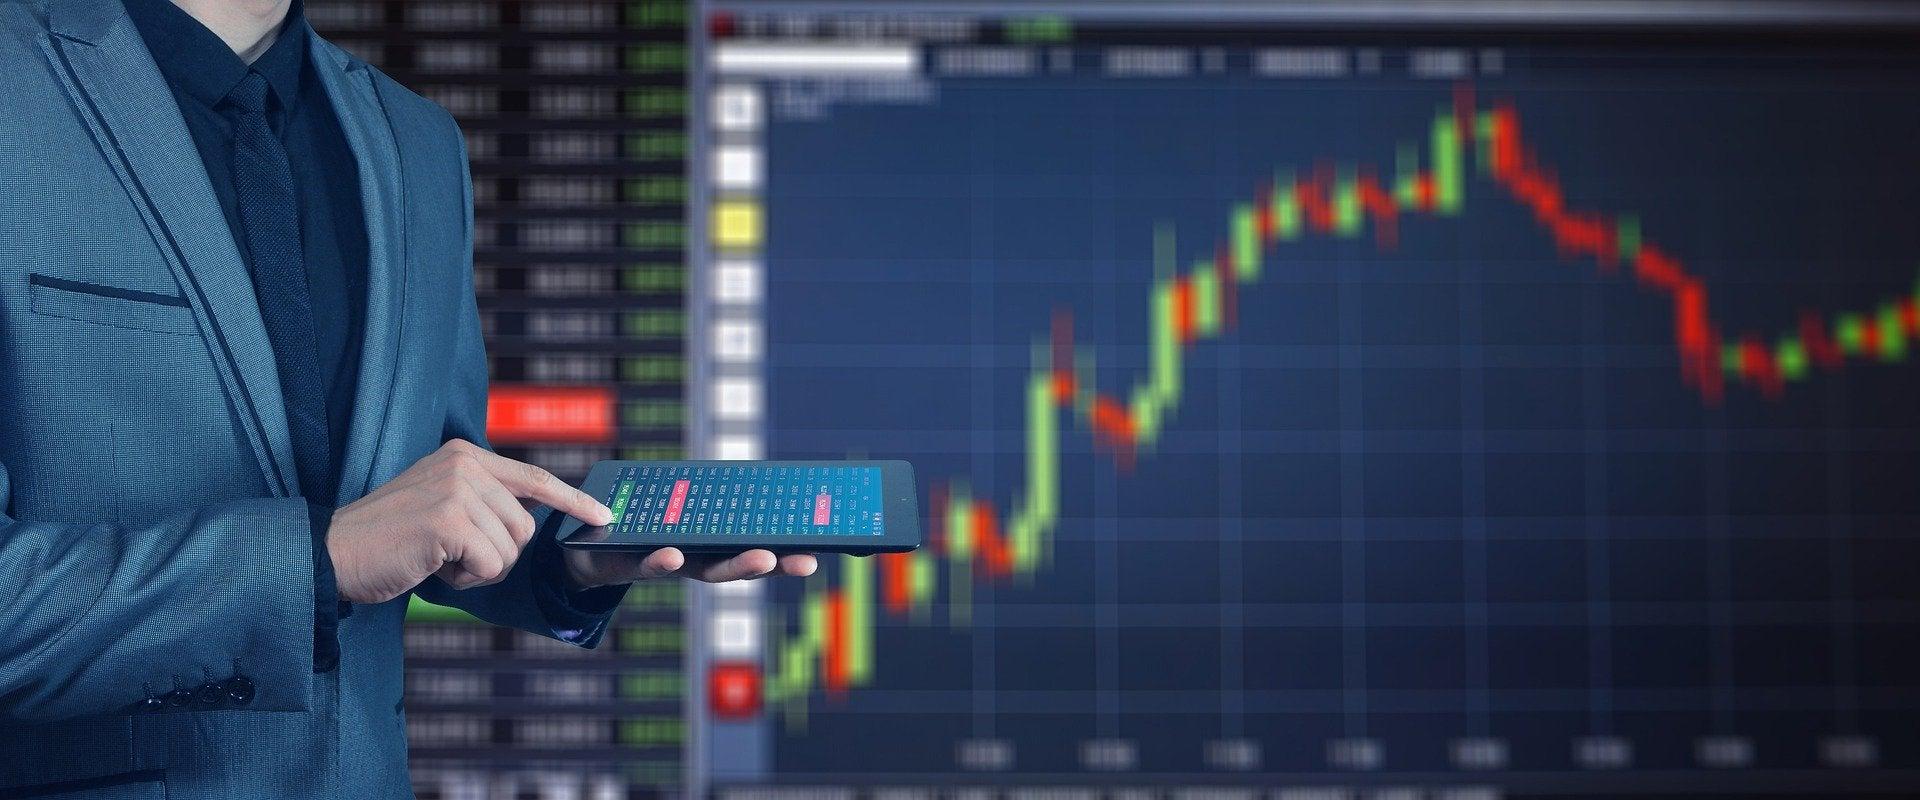 Stock Exchange. Pixabay. Geralt. 18 de Enero, 2018. Pixabay license. Free for comercial use